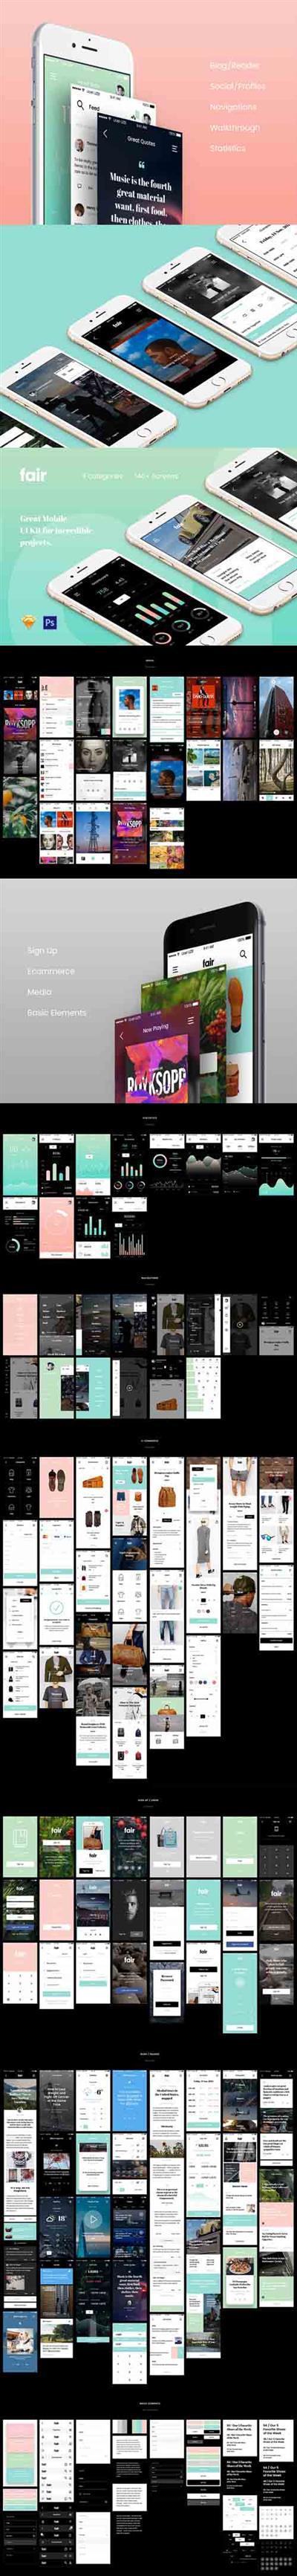 Fair Mobile UI Kit